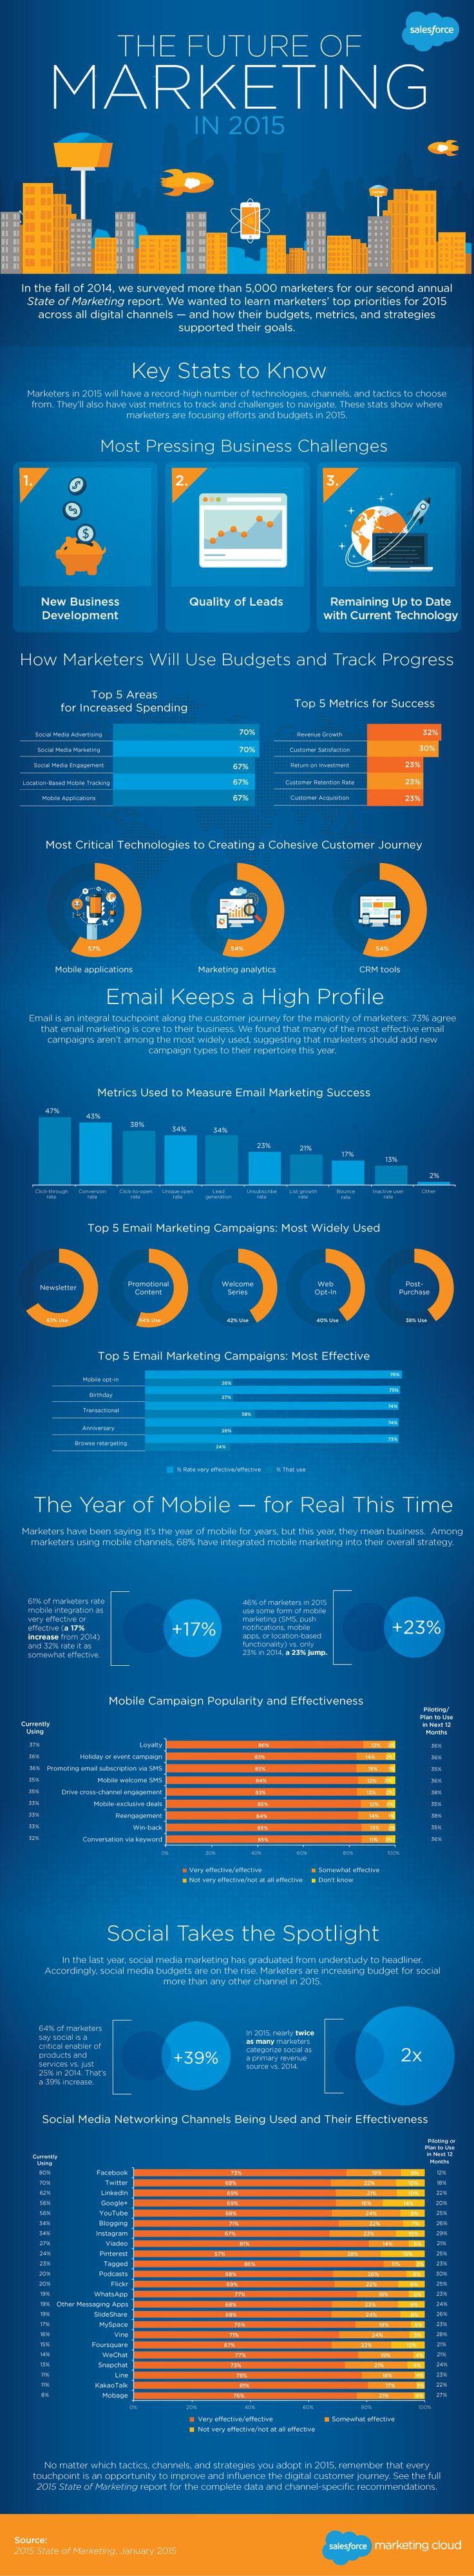 2015 State of #DigitalMarketing - #SMM